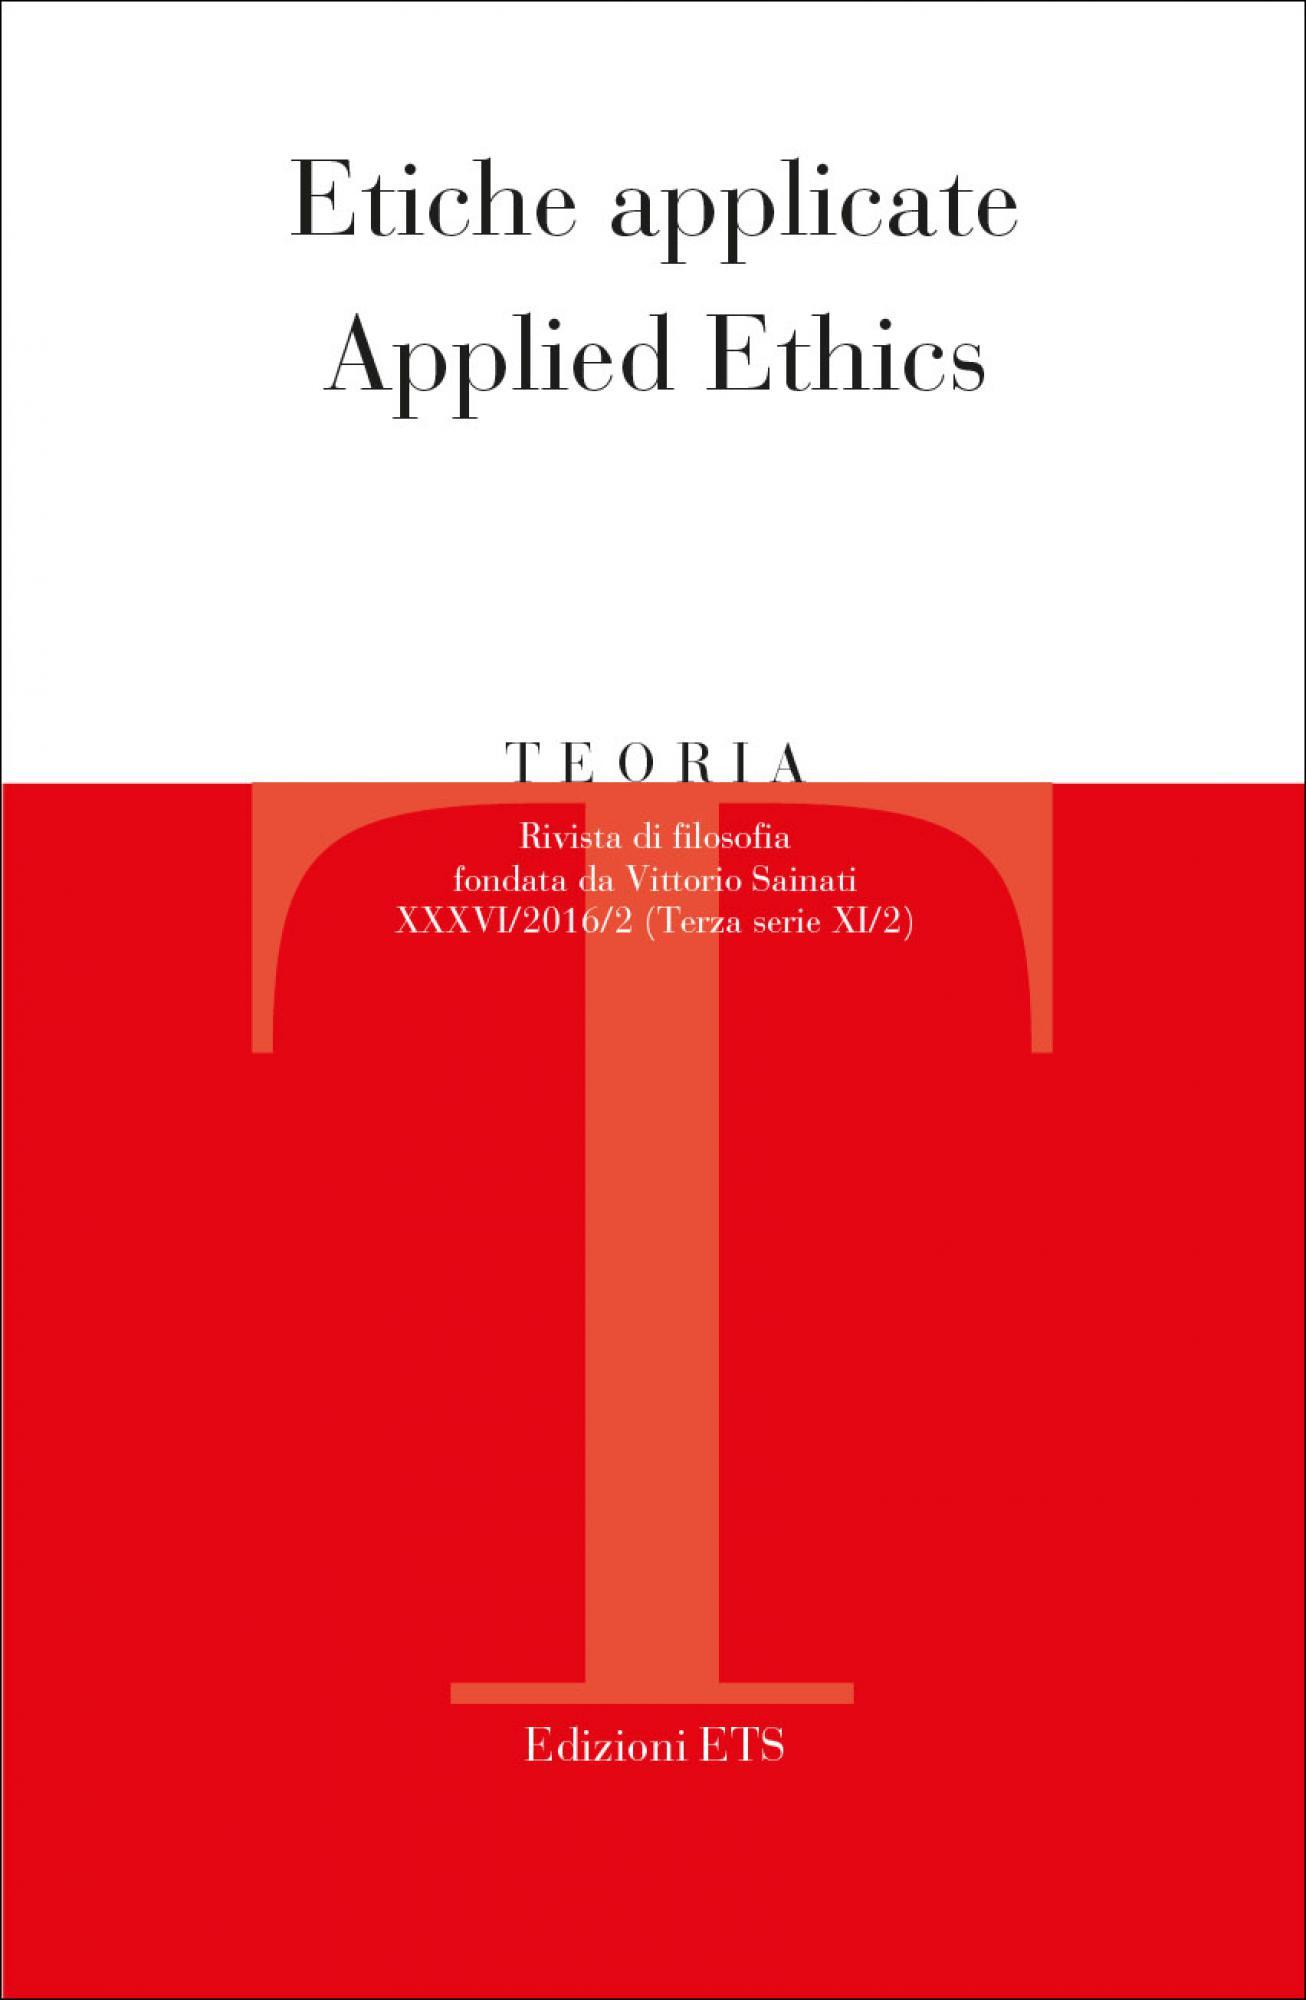 Teoria 2016-2.Etiche applicate / Applied Ethics